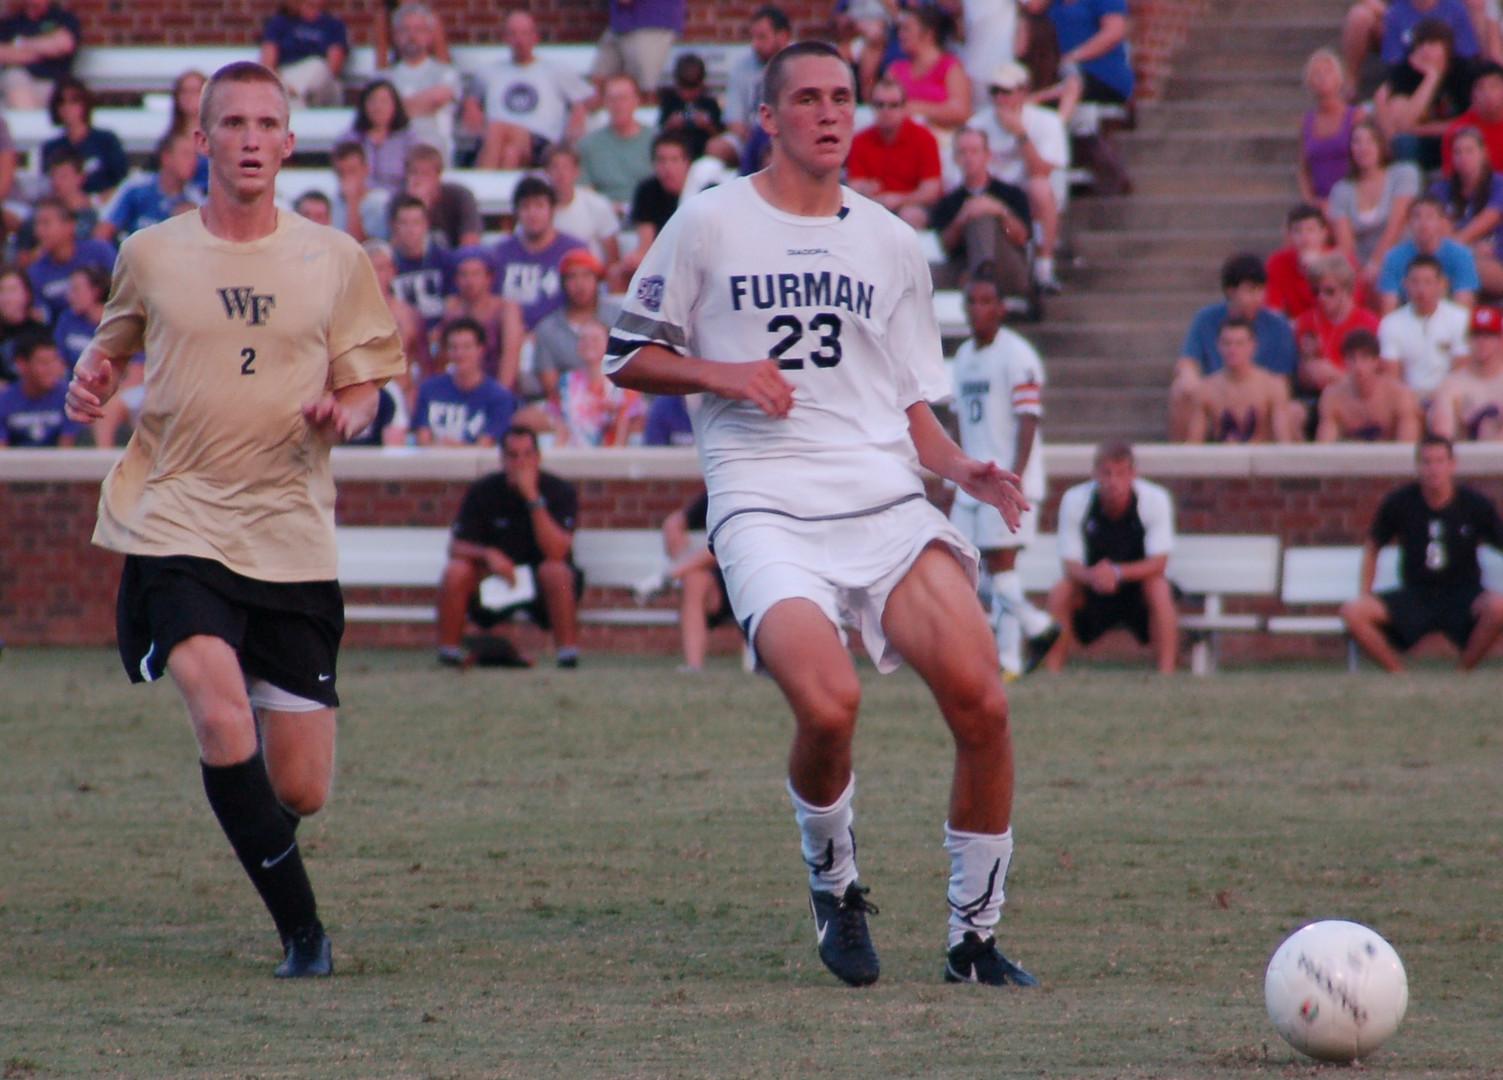 Furman Soccer